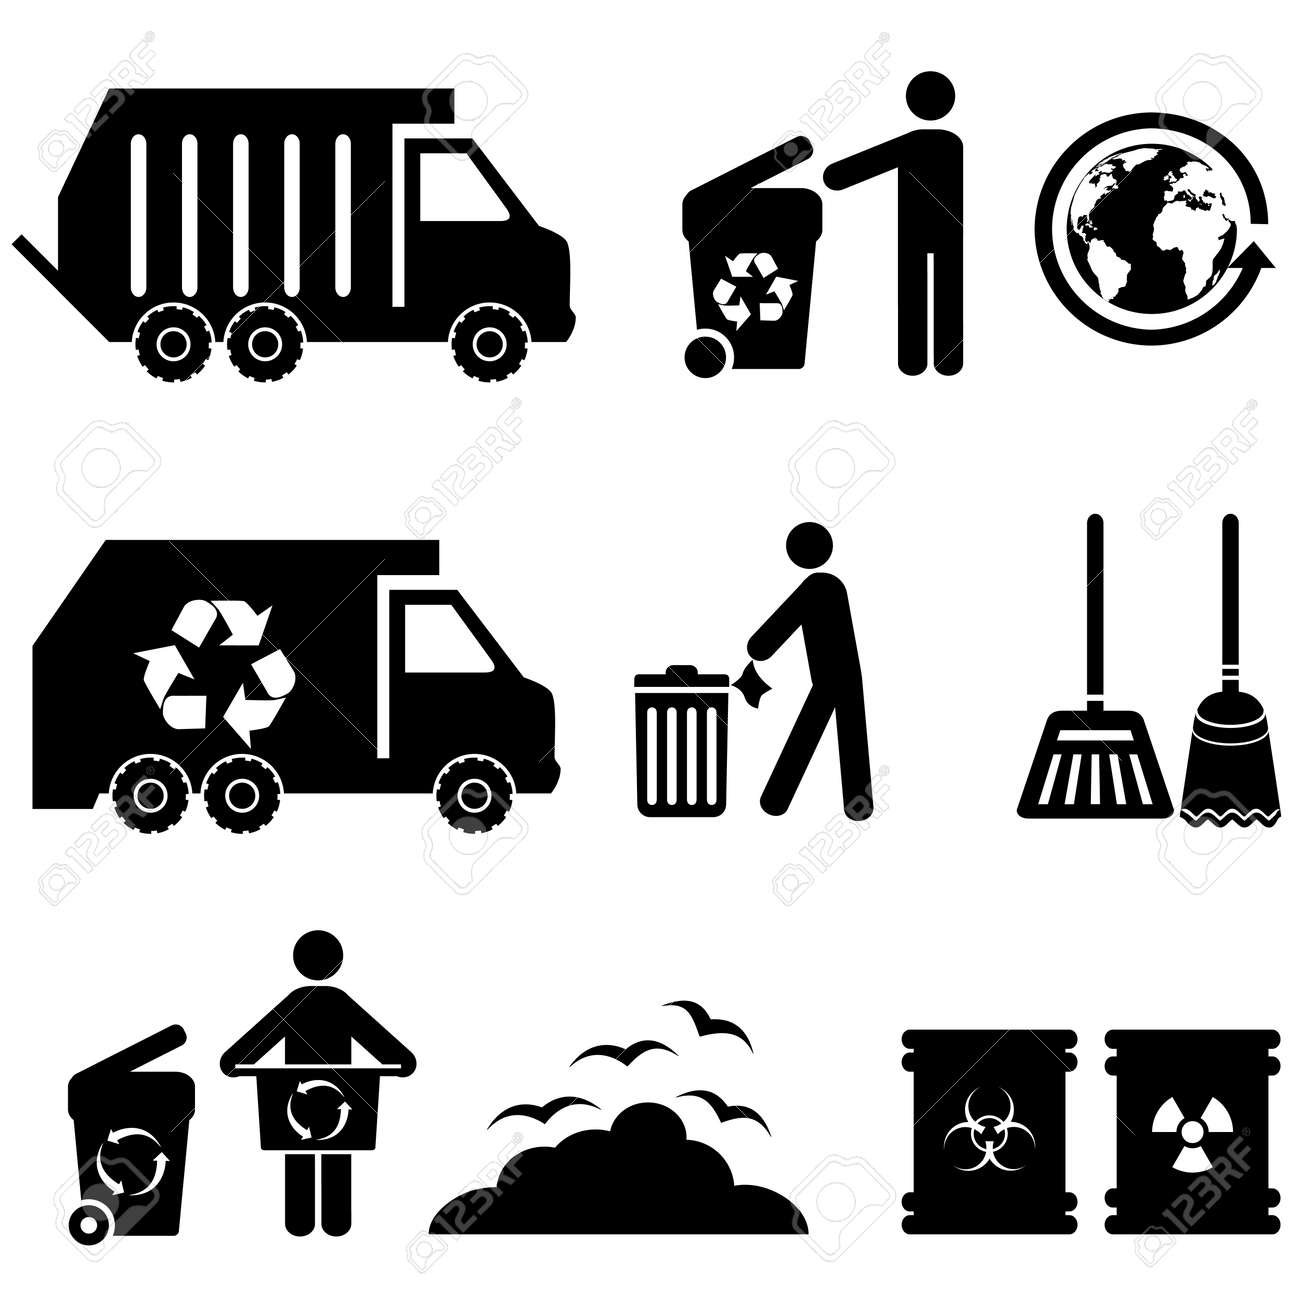 Trash, garbage and waste icon set - 23019488